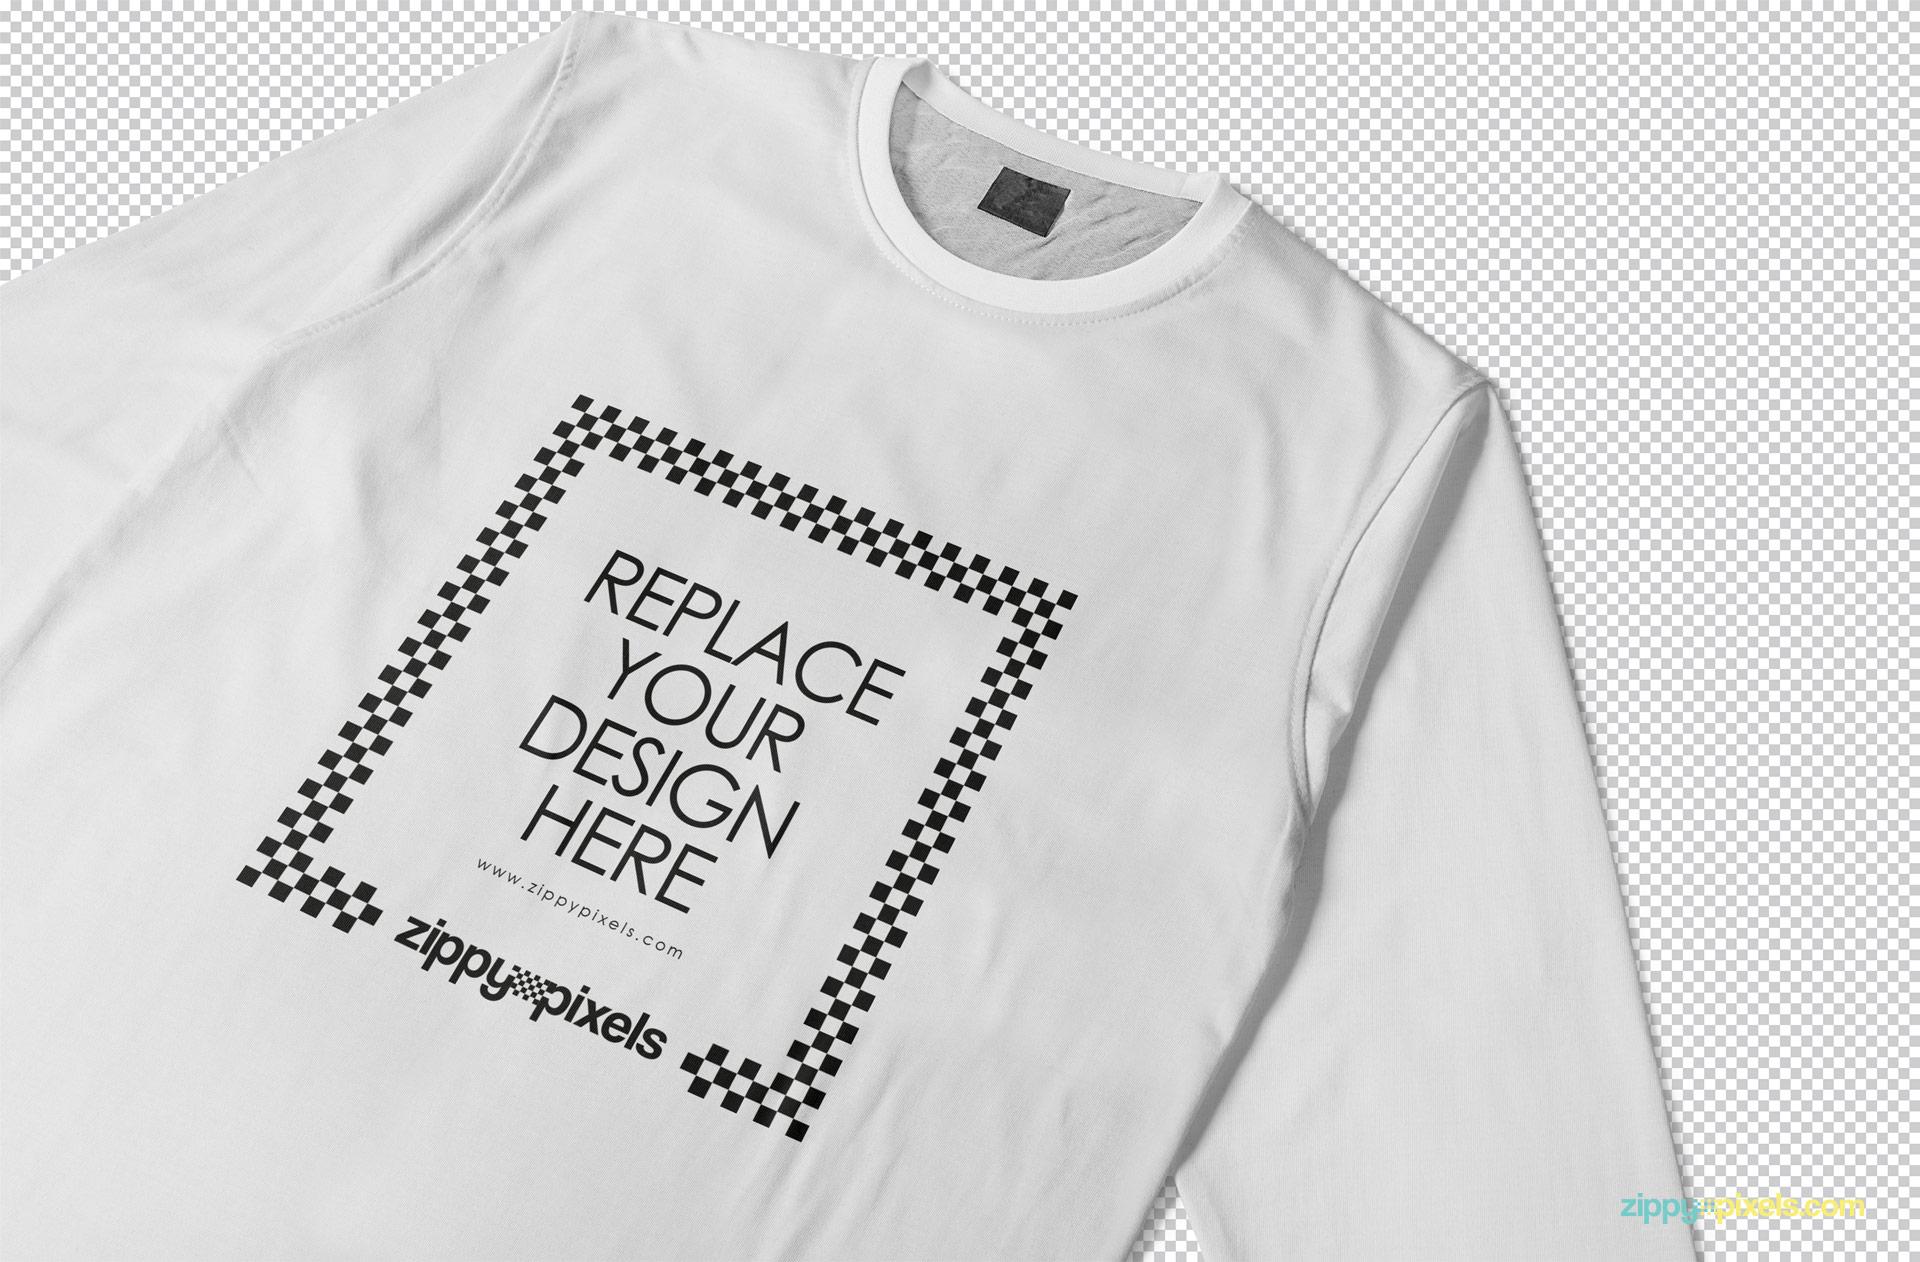 kaos mockup depan belakang psd. Free Long Sleeve T Shirt Mockup Zippypixels